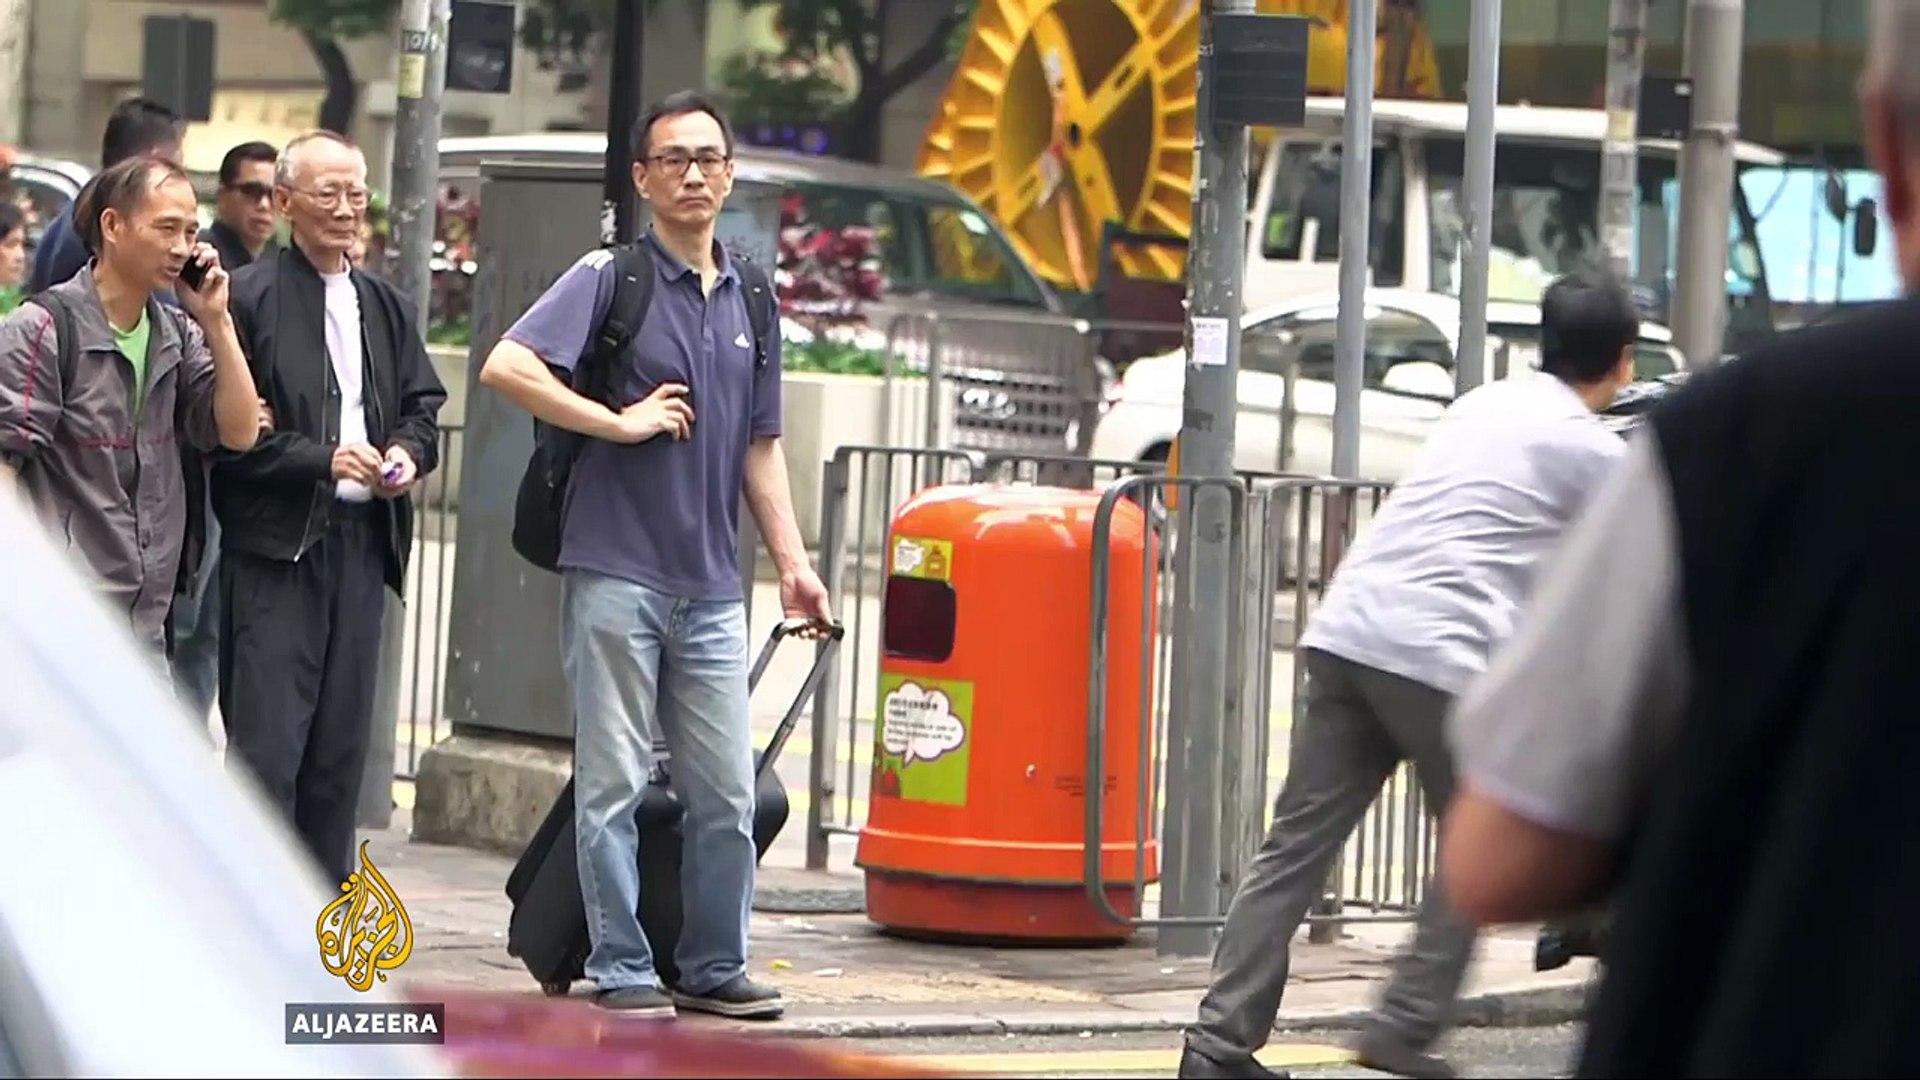 Hong Kong: 20% lives in poverty